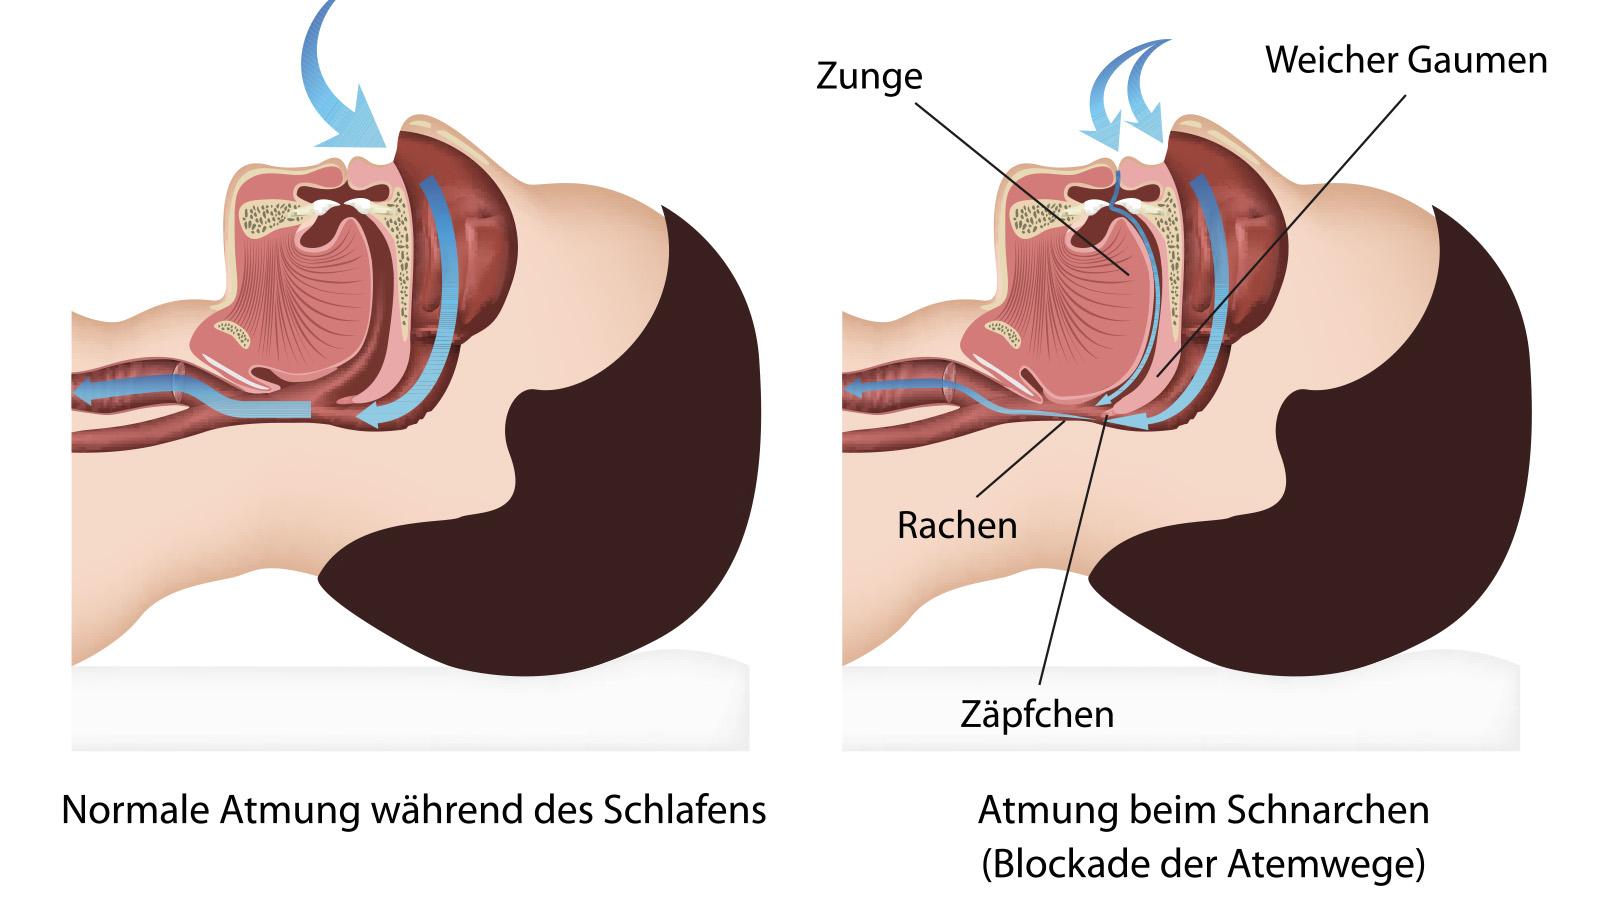 Symptom Schnarchen